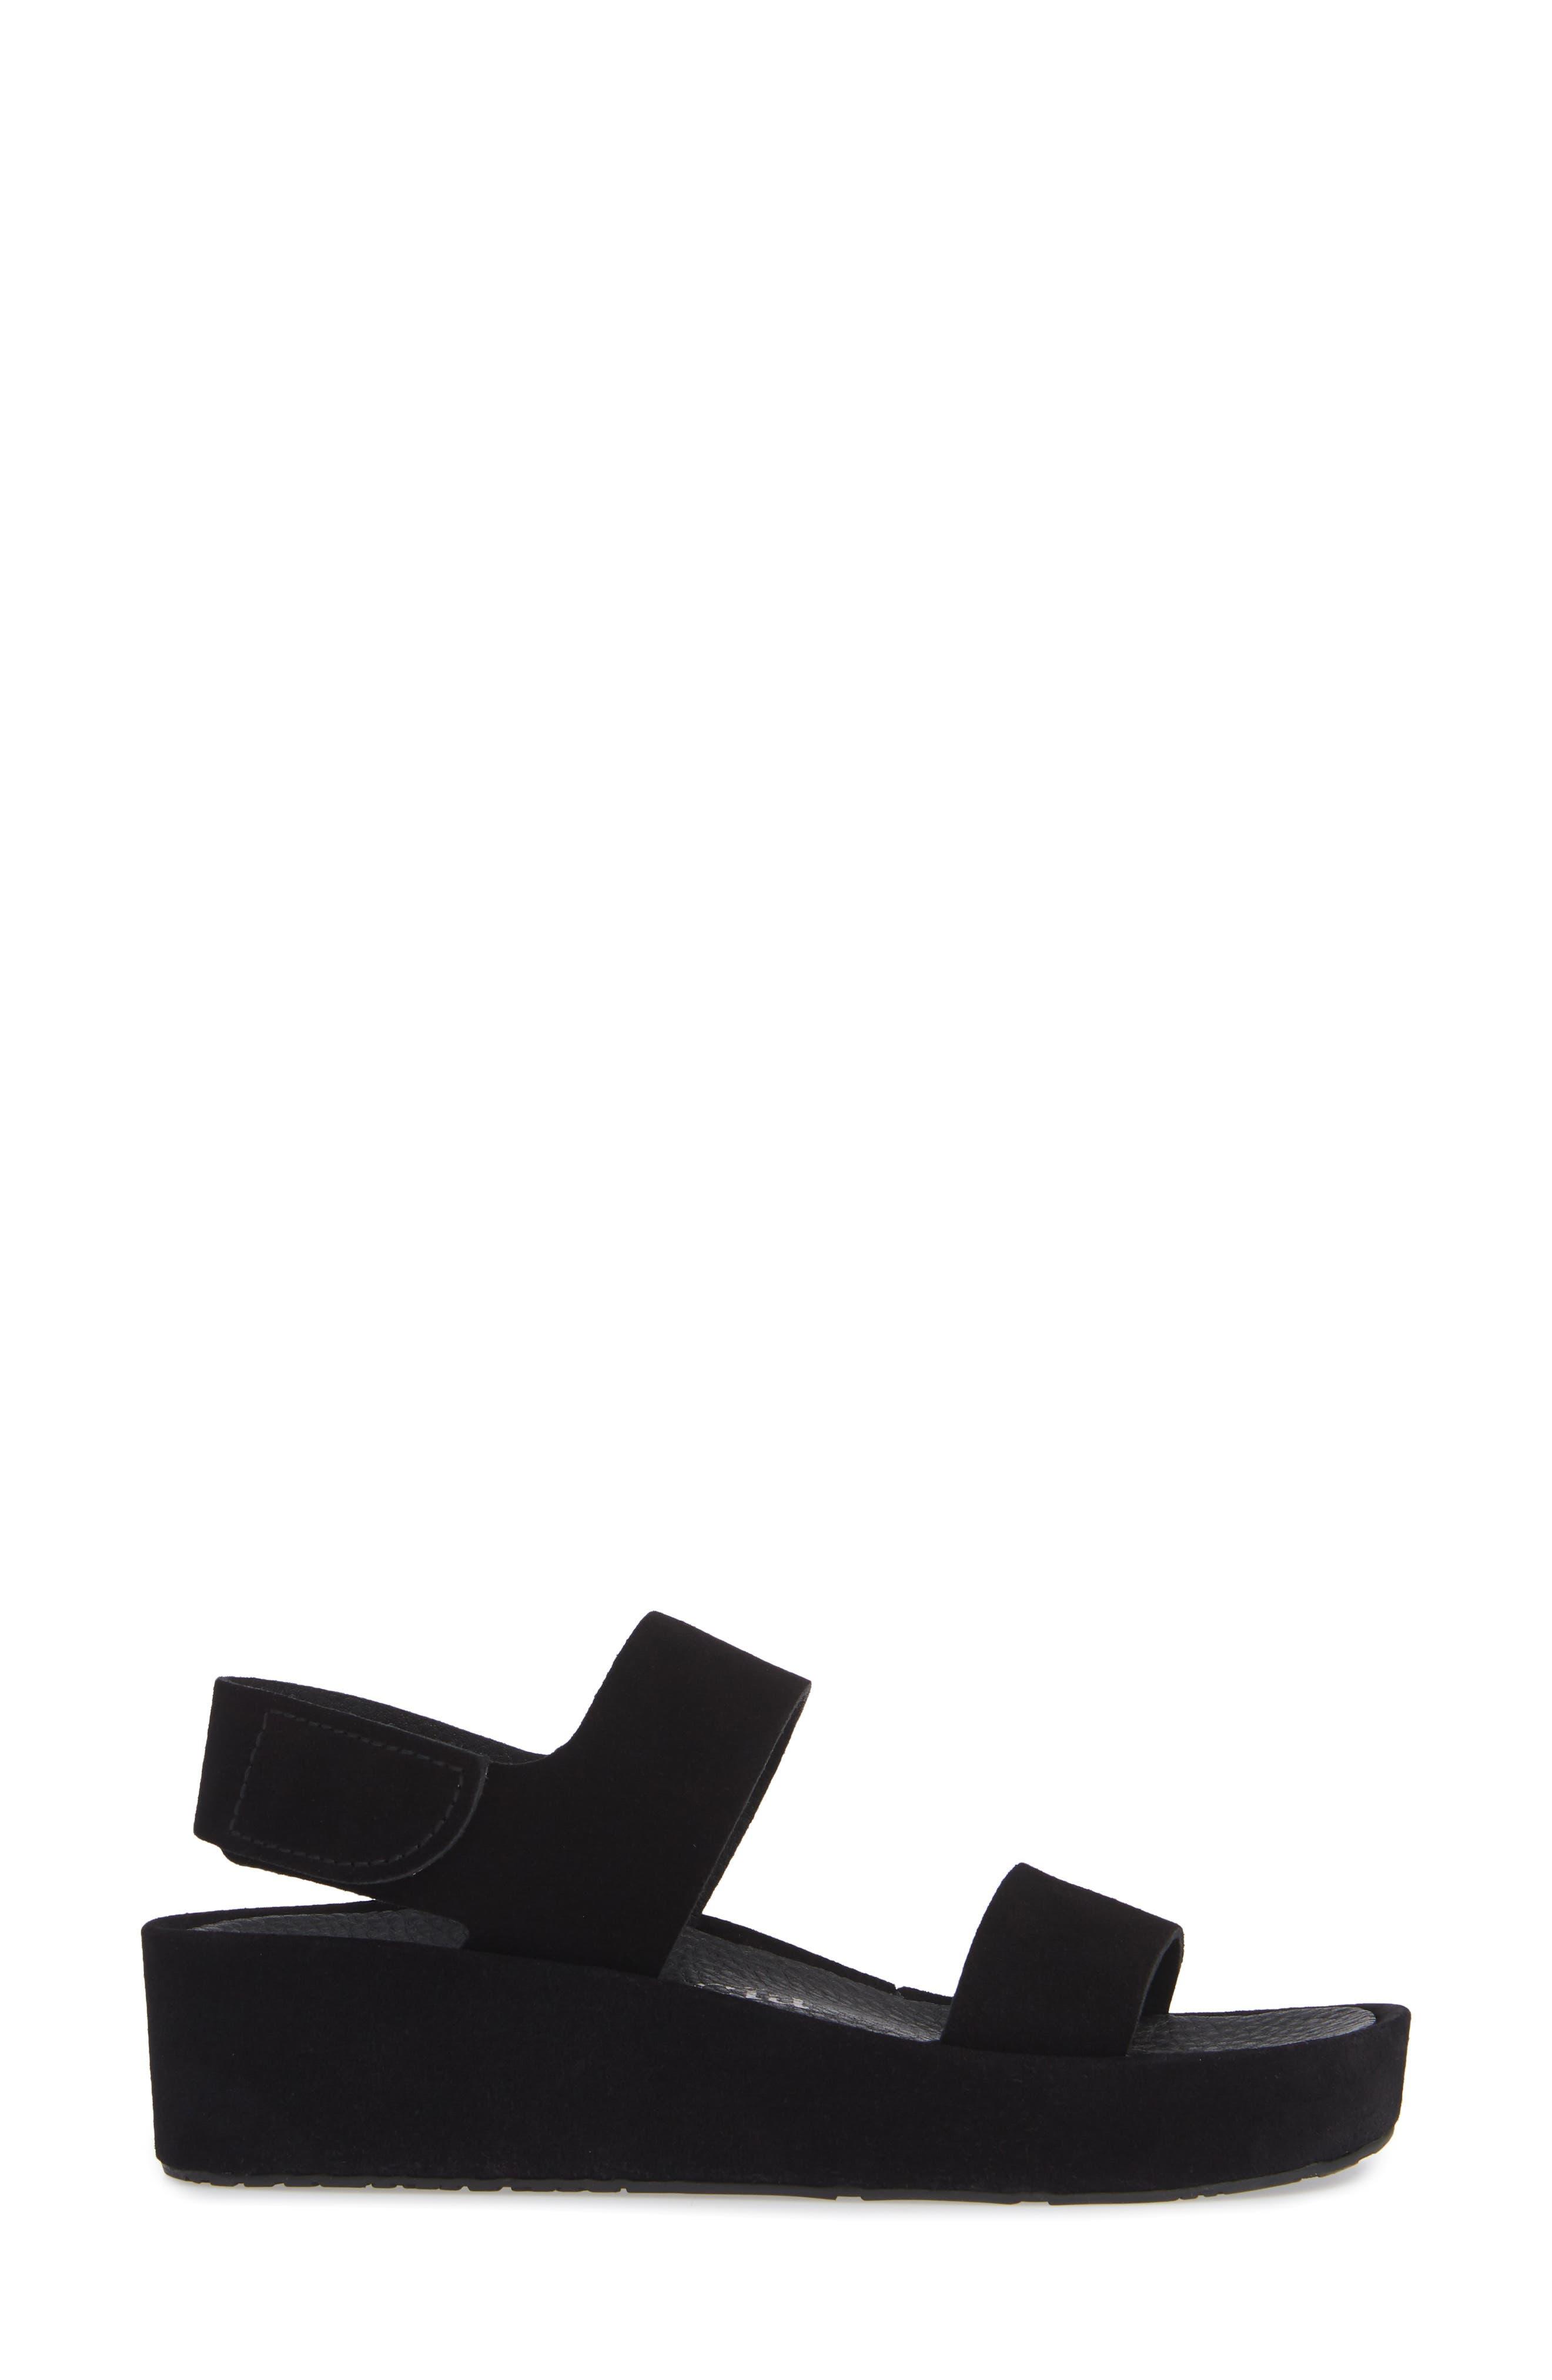 Lacey Footbed Sandal,                             Alternate thumbnail 3, color,                             BLACK CASTORO